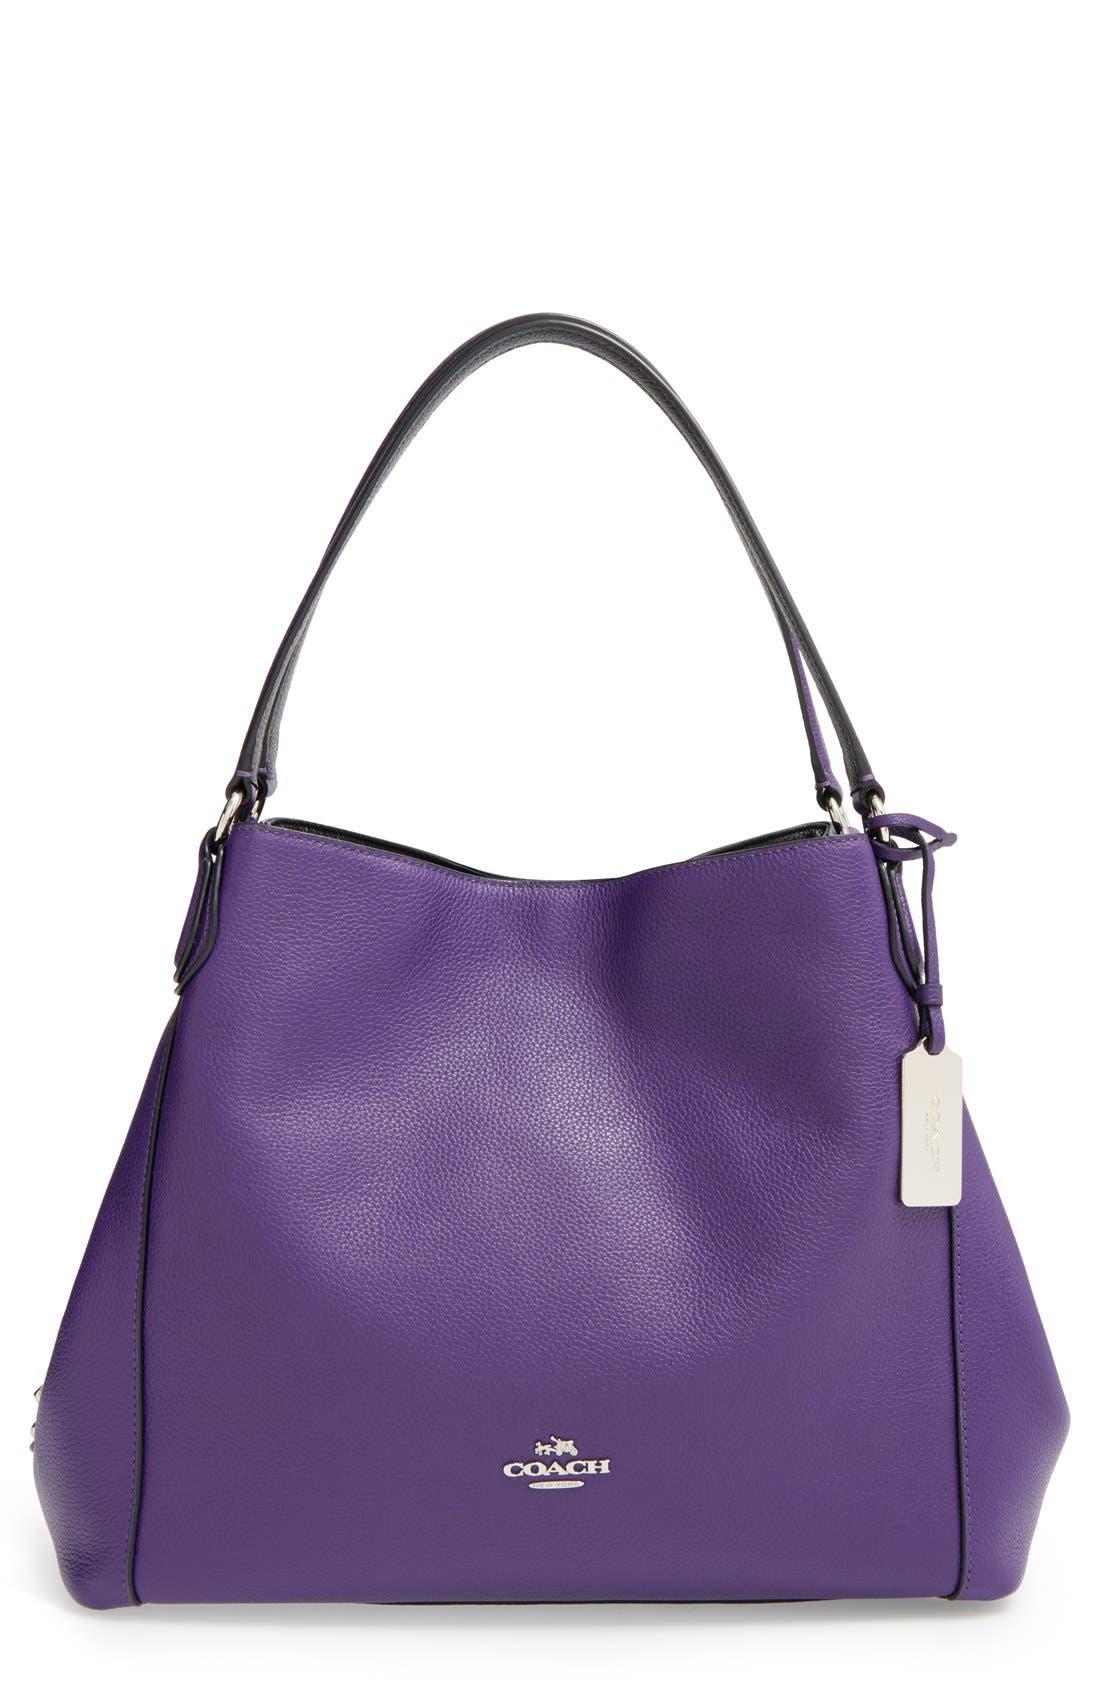 COACH 'Edie 31' Pebbled Leather Shoulder Bag, Main, color, 500